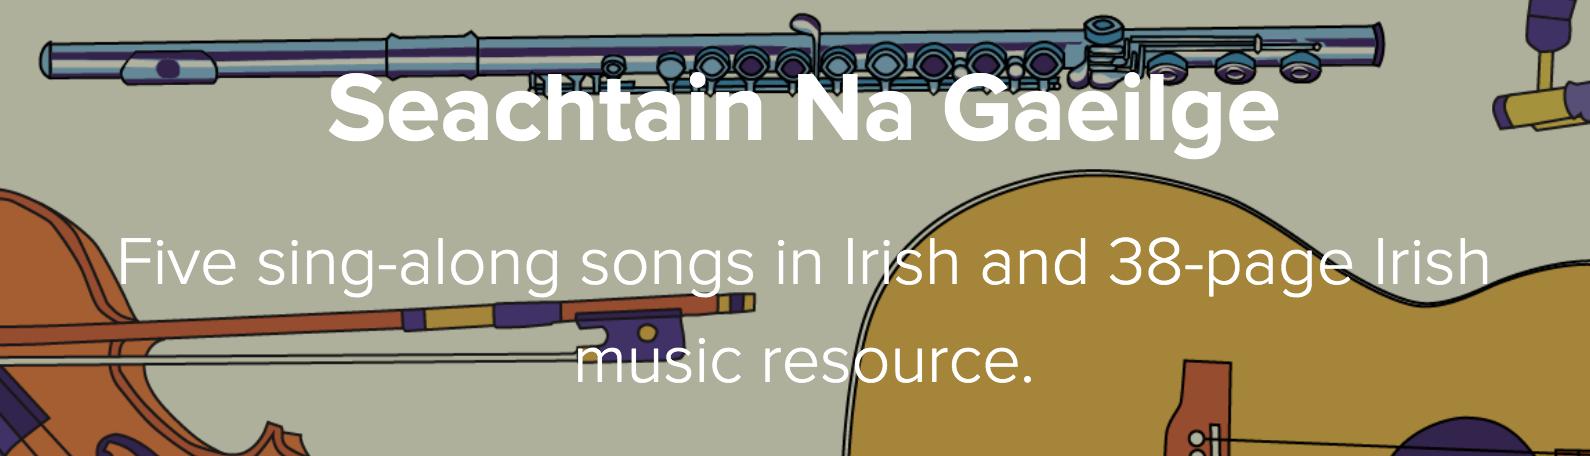 DabbledooMusic Seachtain Na Gaeilge Course